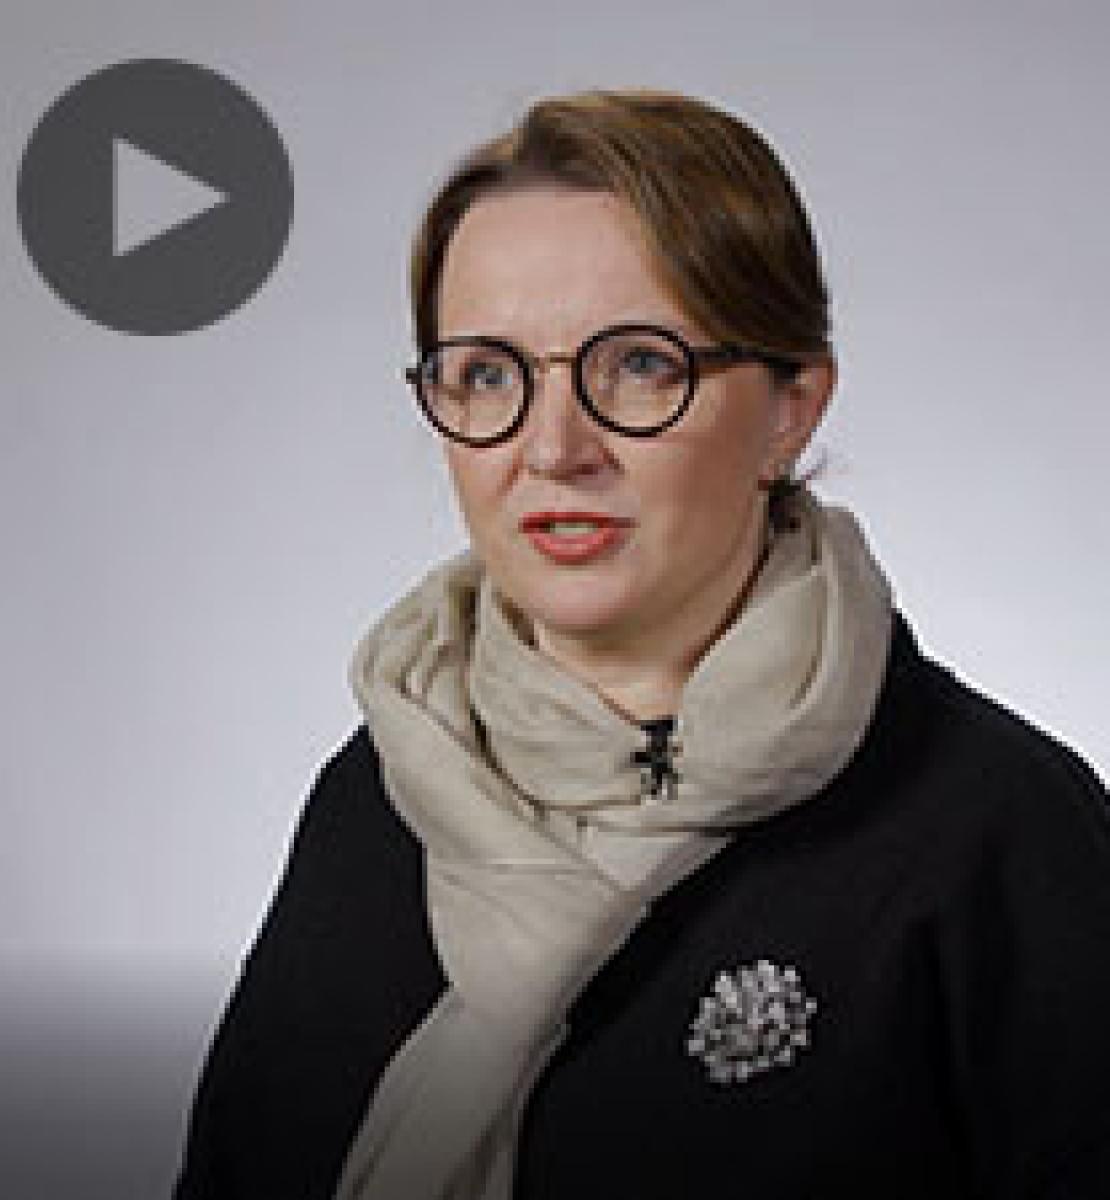 Screenshot from video message shows Resident Coordinator, Joanna Kazana-Wisniowiecki